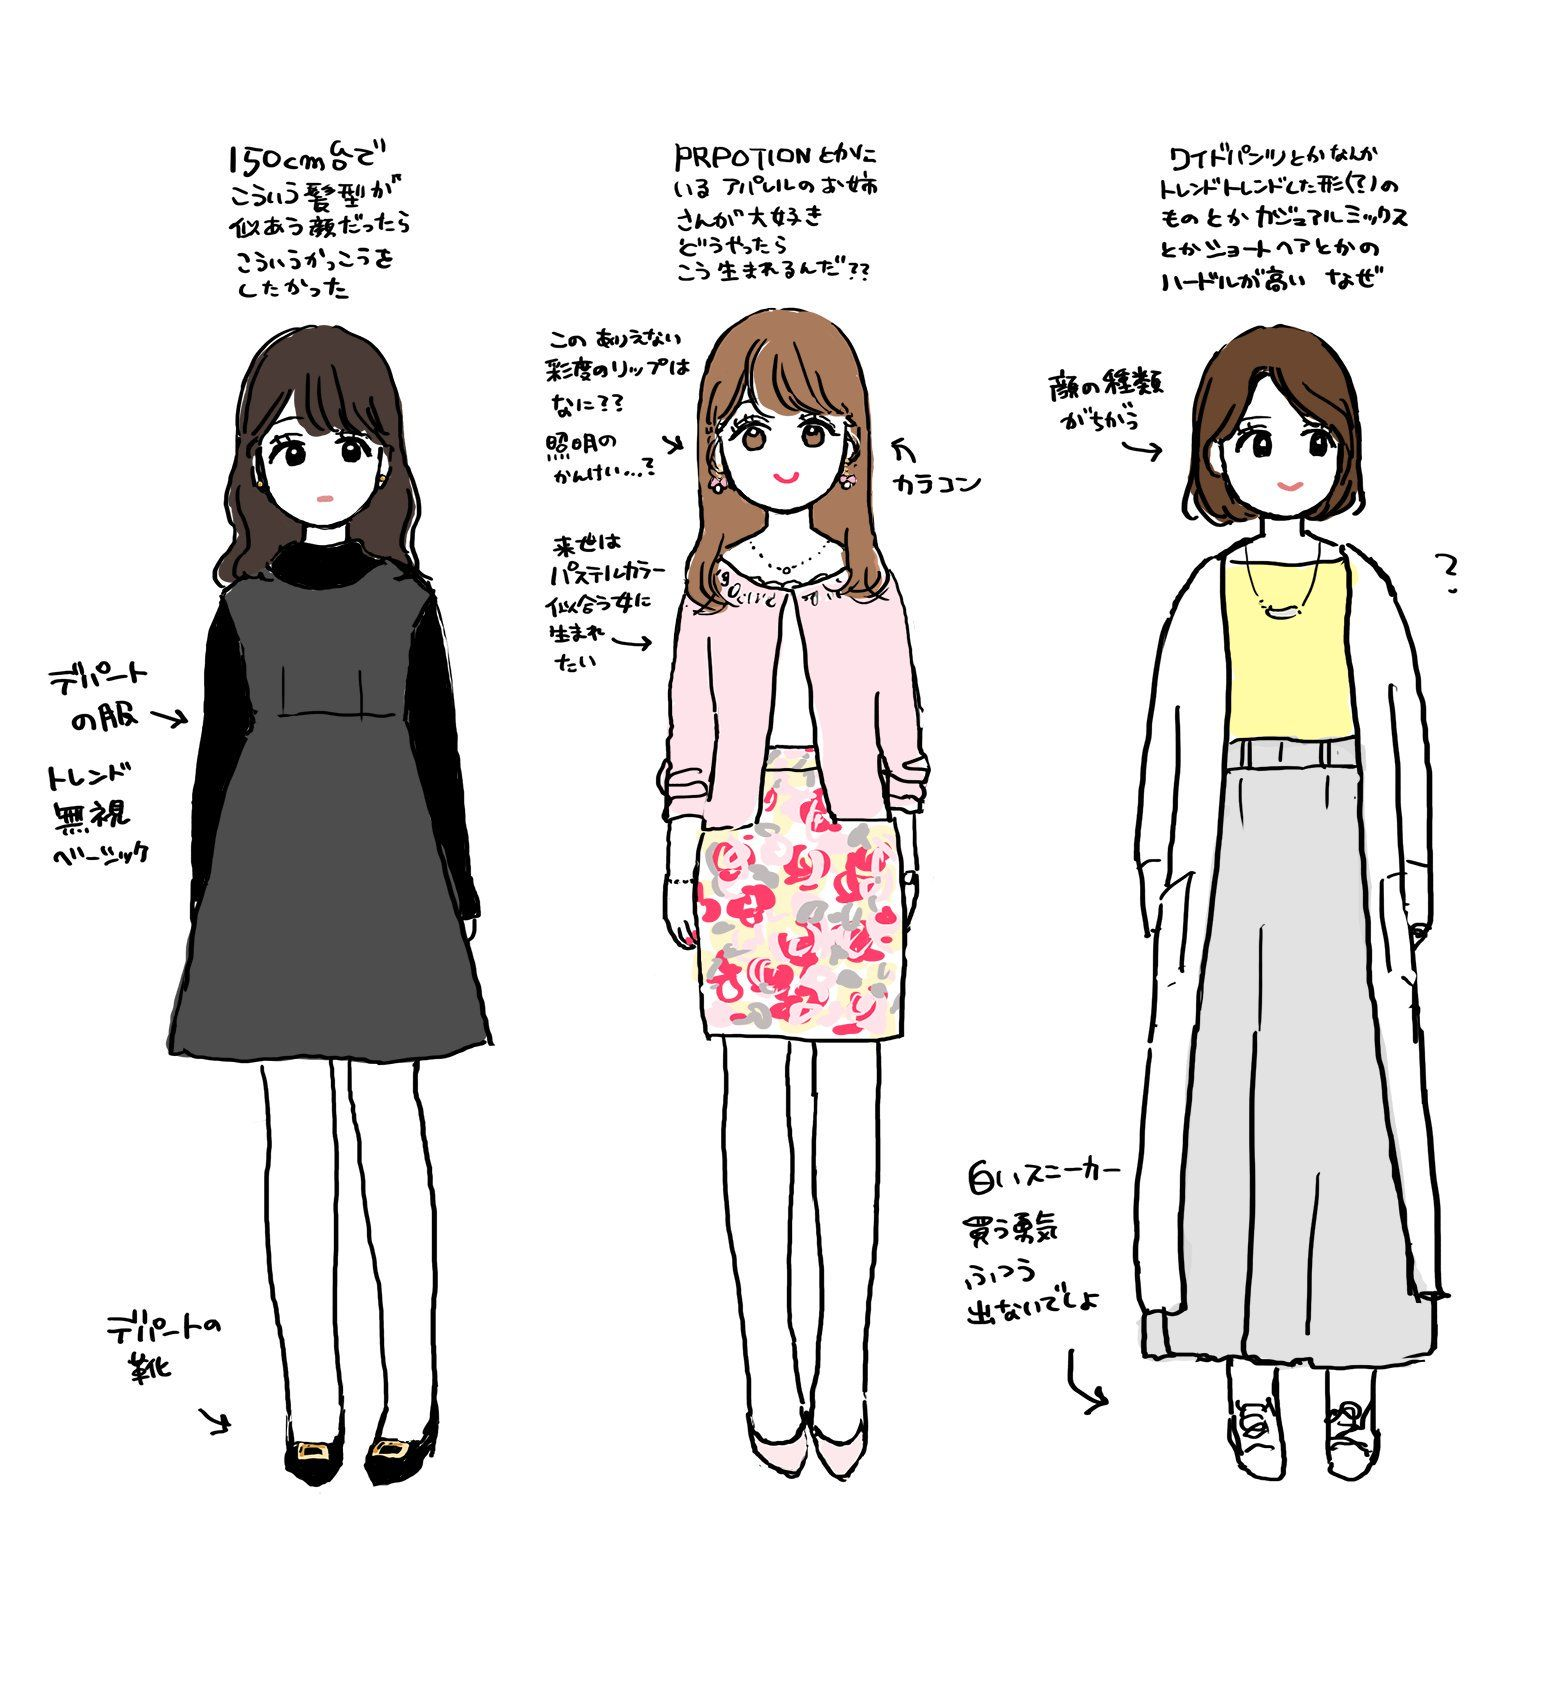 16 000rt 着たい服 じゃなくて こういう女に生まれたかった イラスト イラスト ファッションセット かわいい